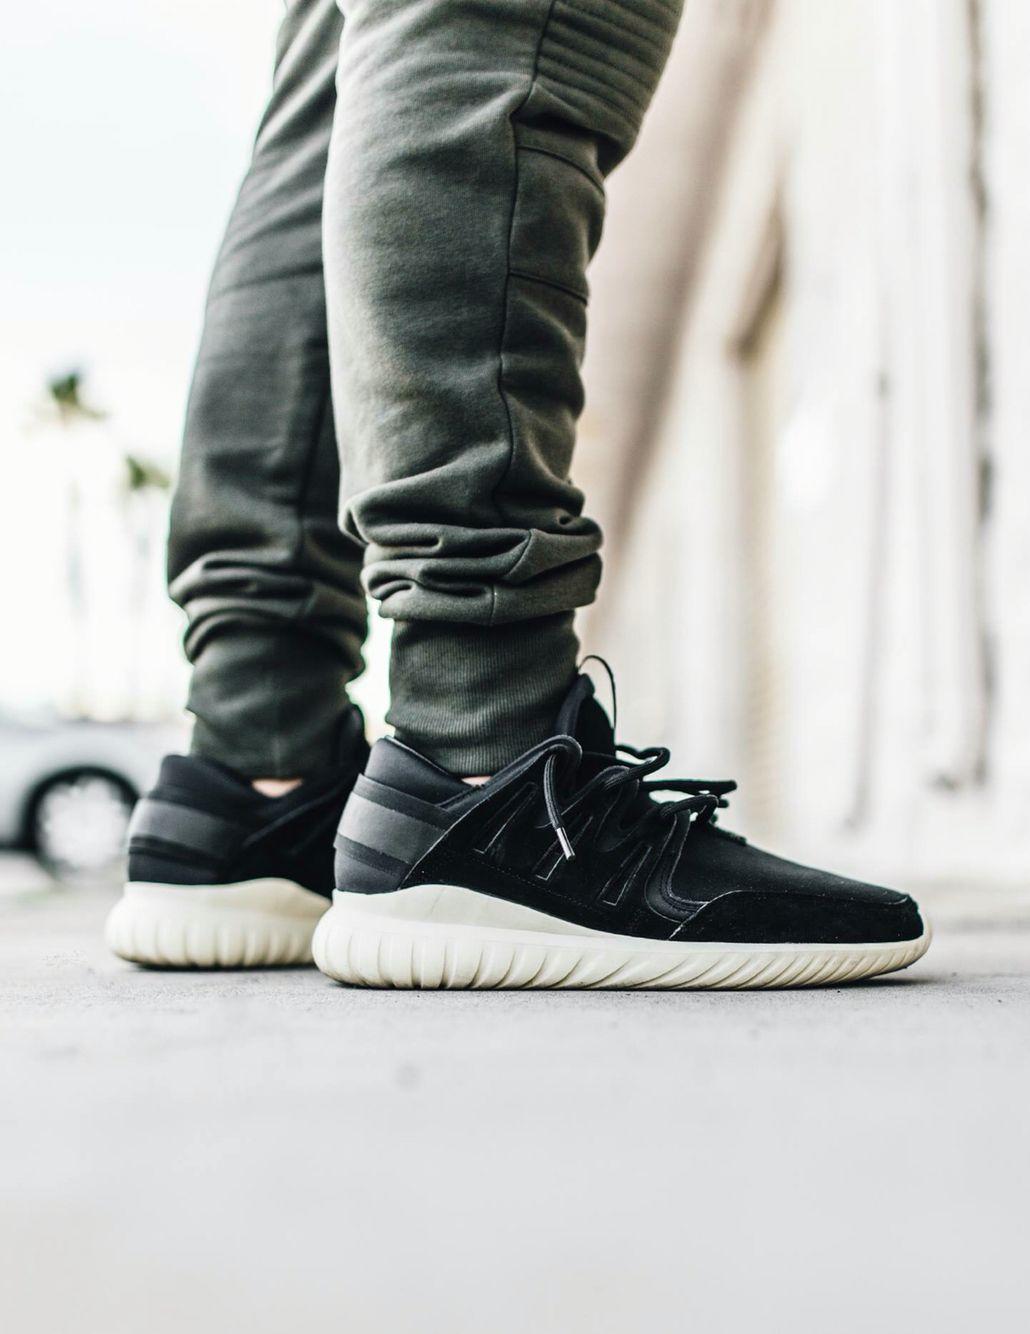 Adidas Originals tubular Nova patadas Pinterest Adidas, online